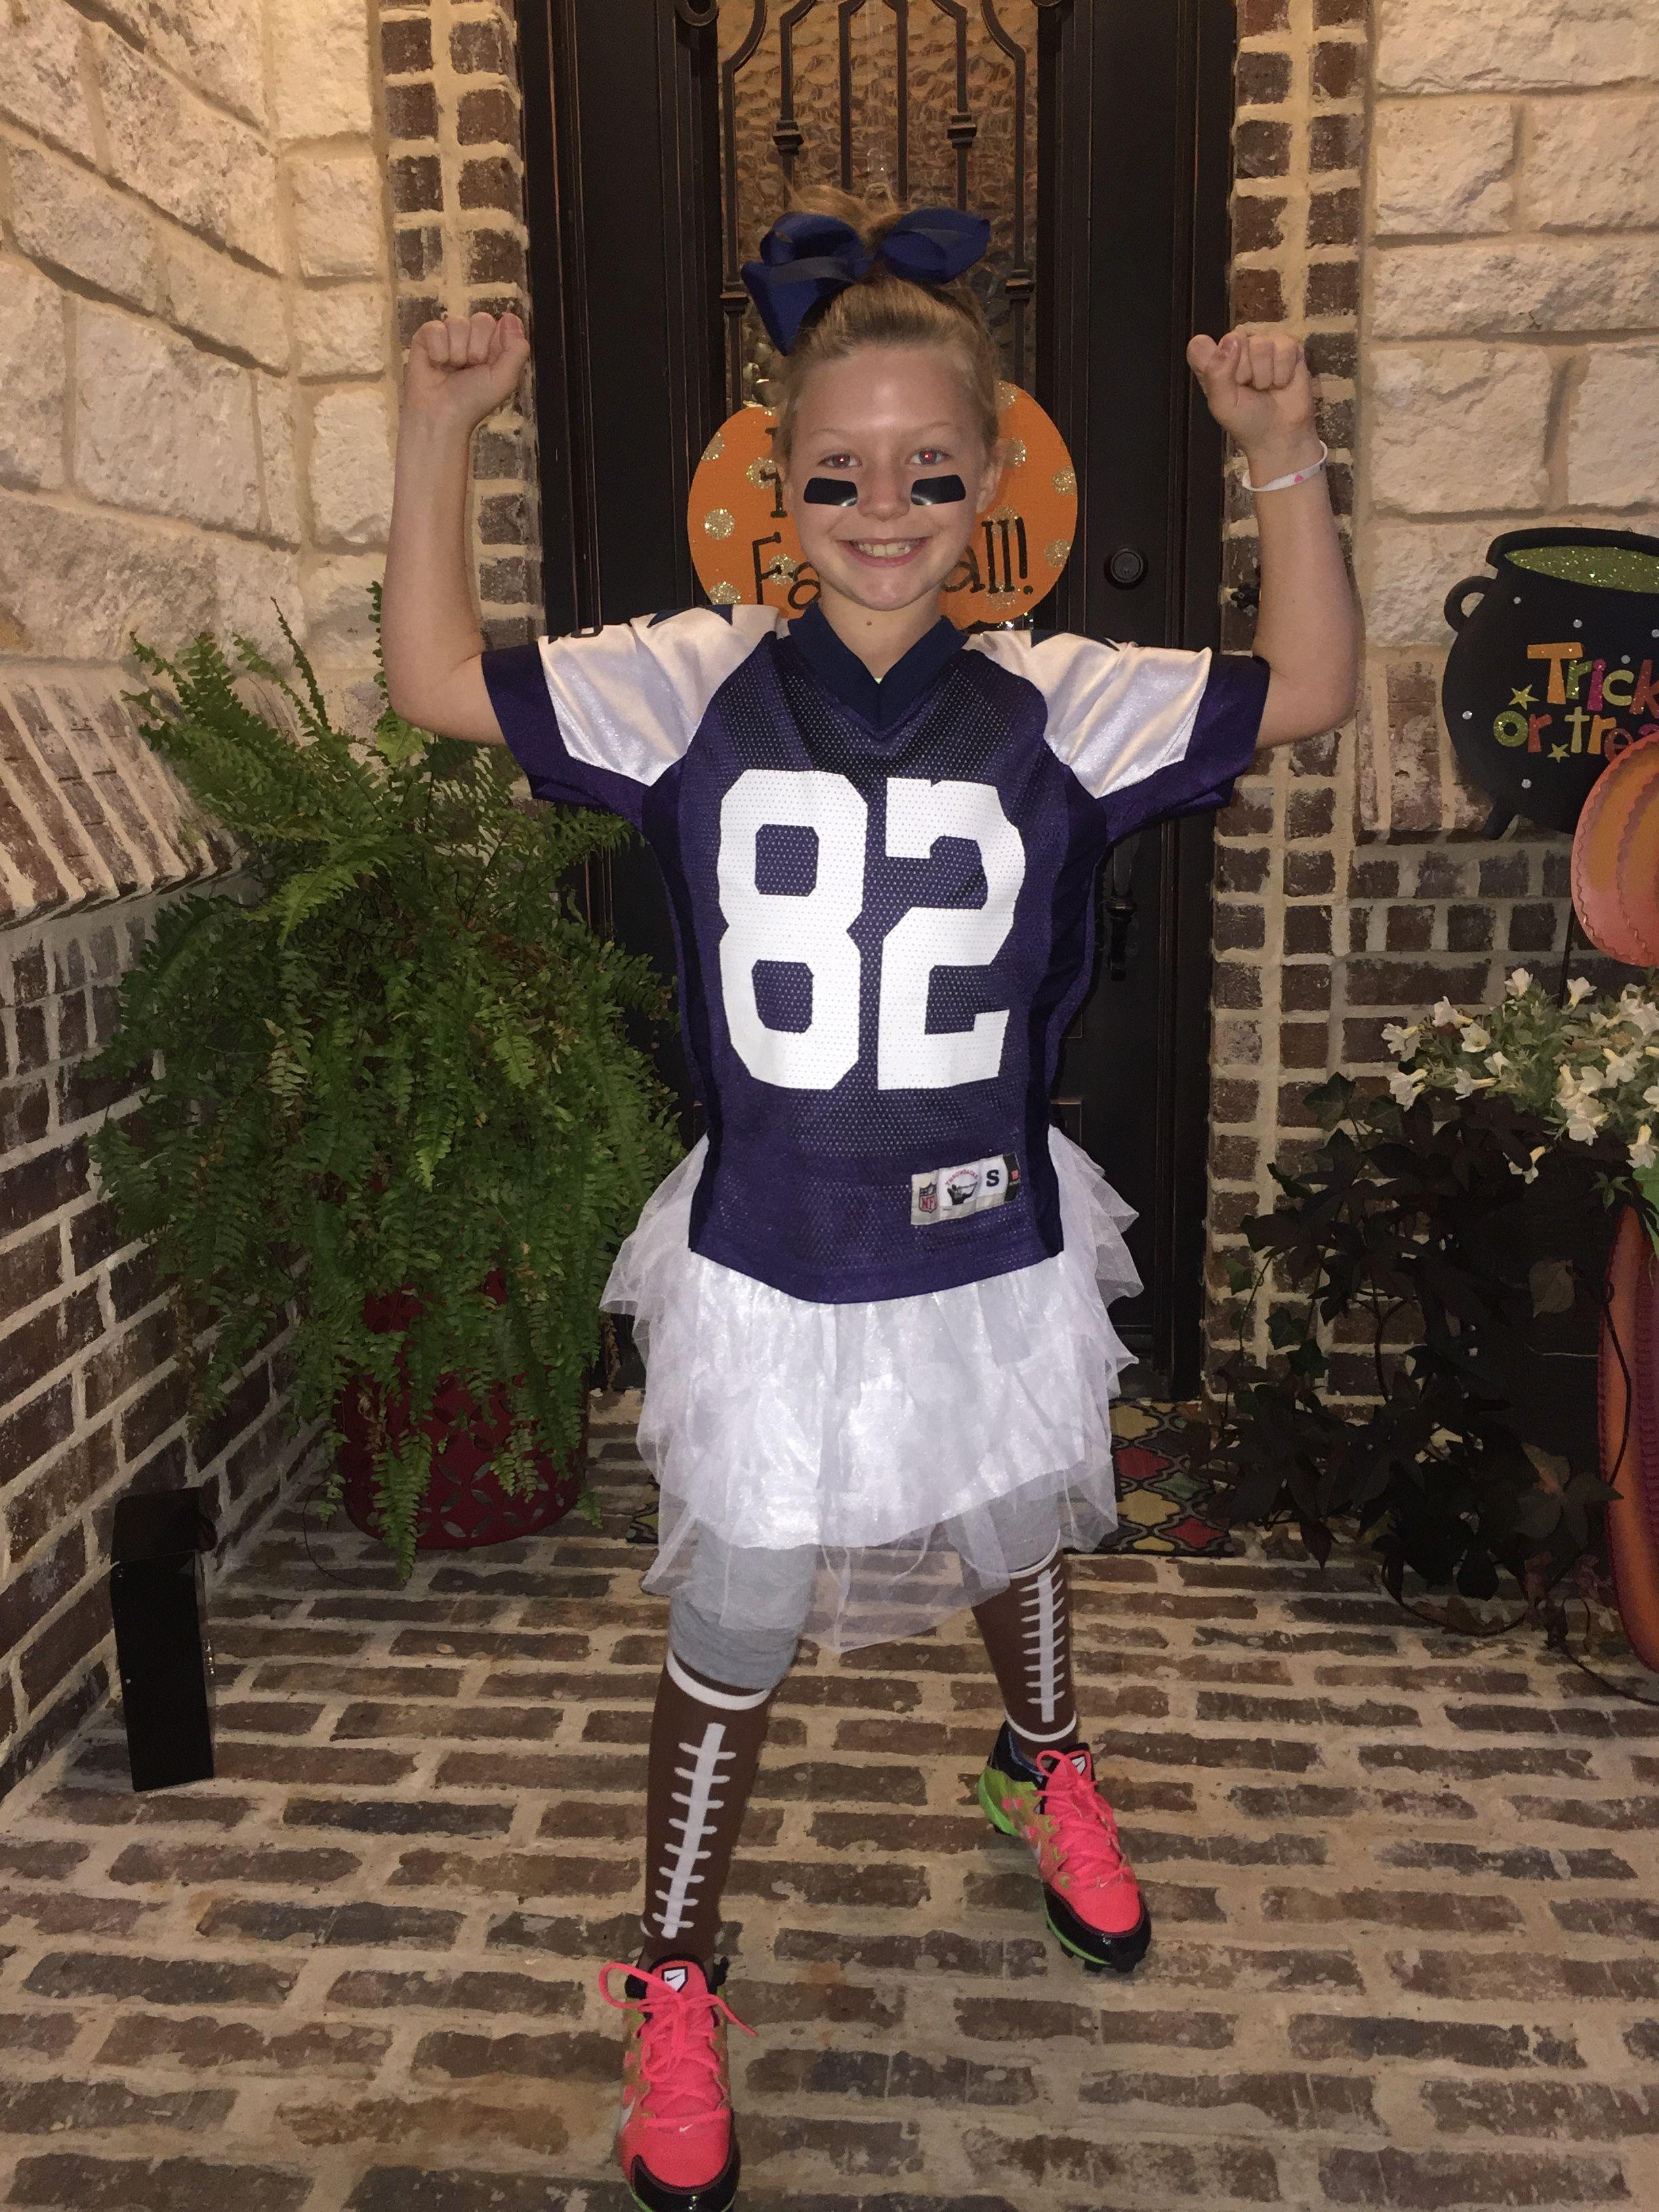 Football Player Halloween Costume.Pin On Halloween Costume